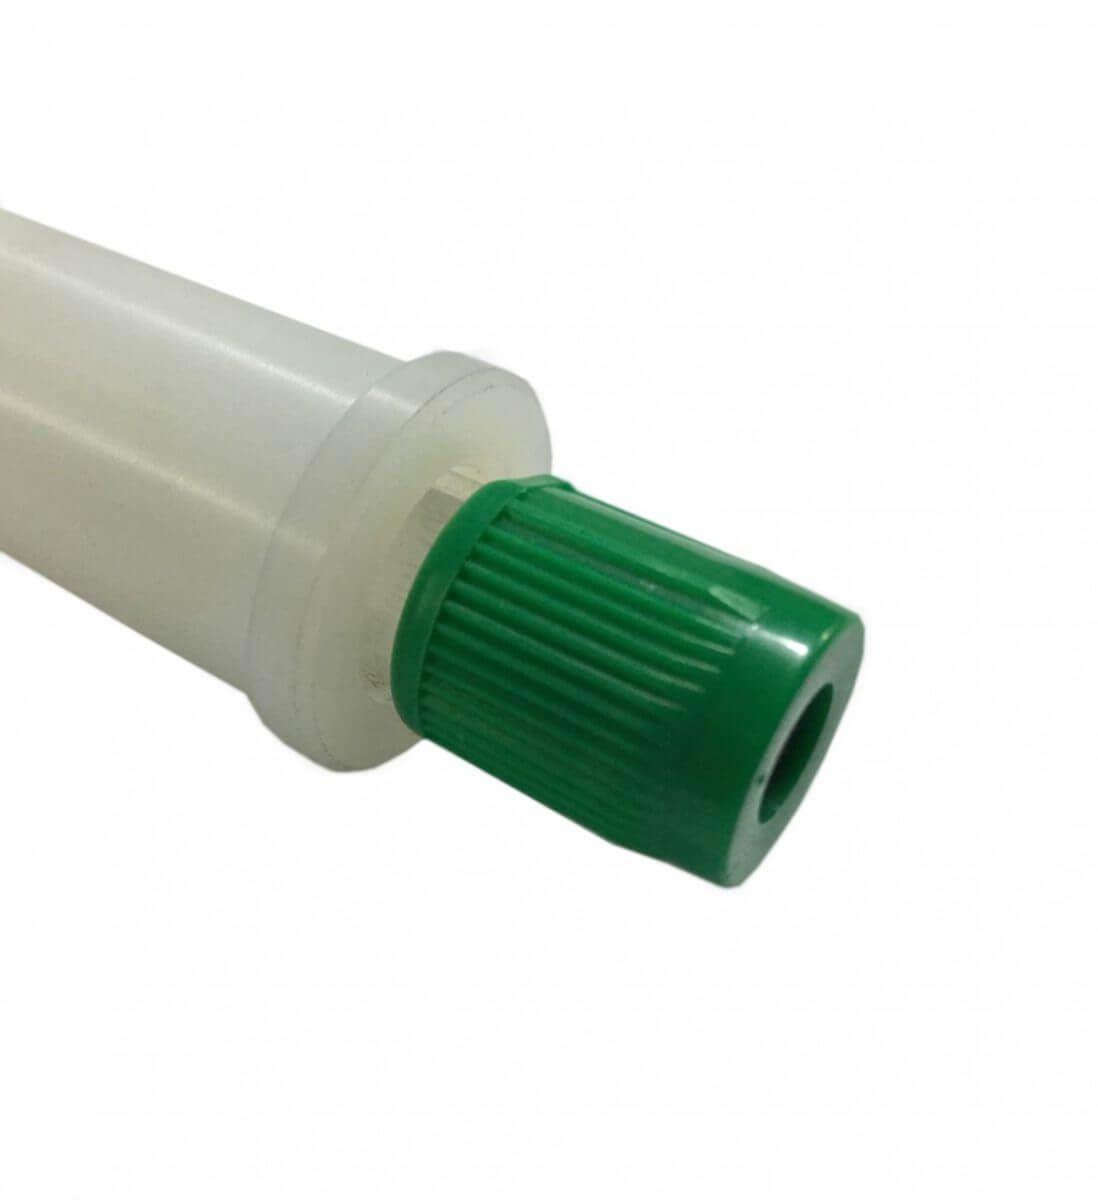 Adaptadores para Tubos a Vácuo p/ Centrifugas